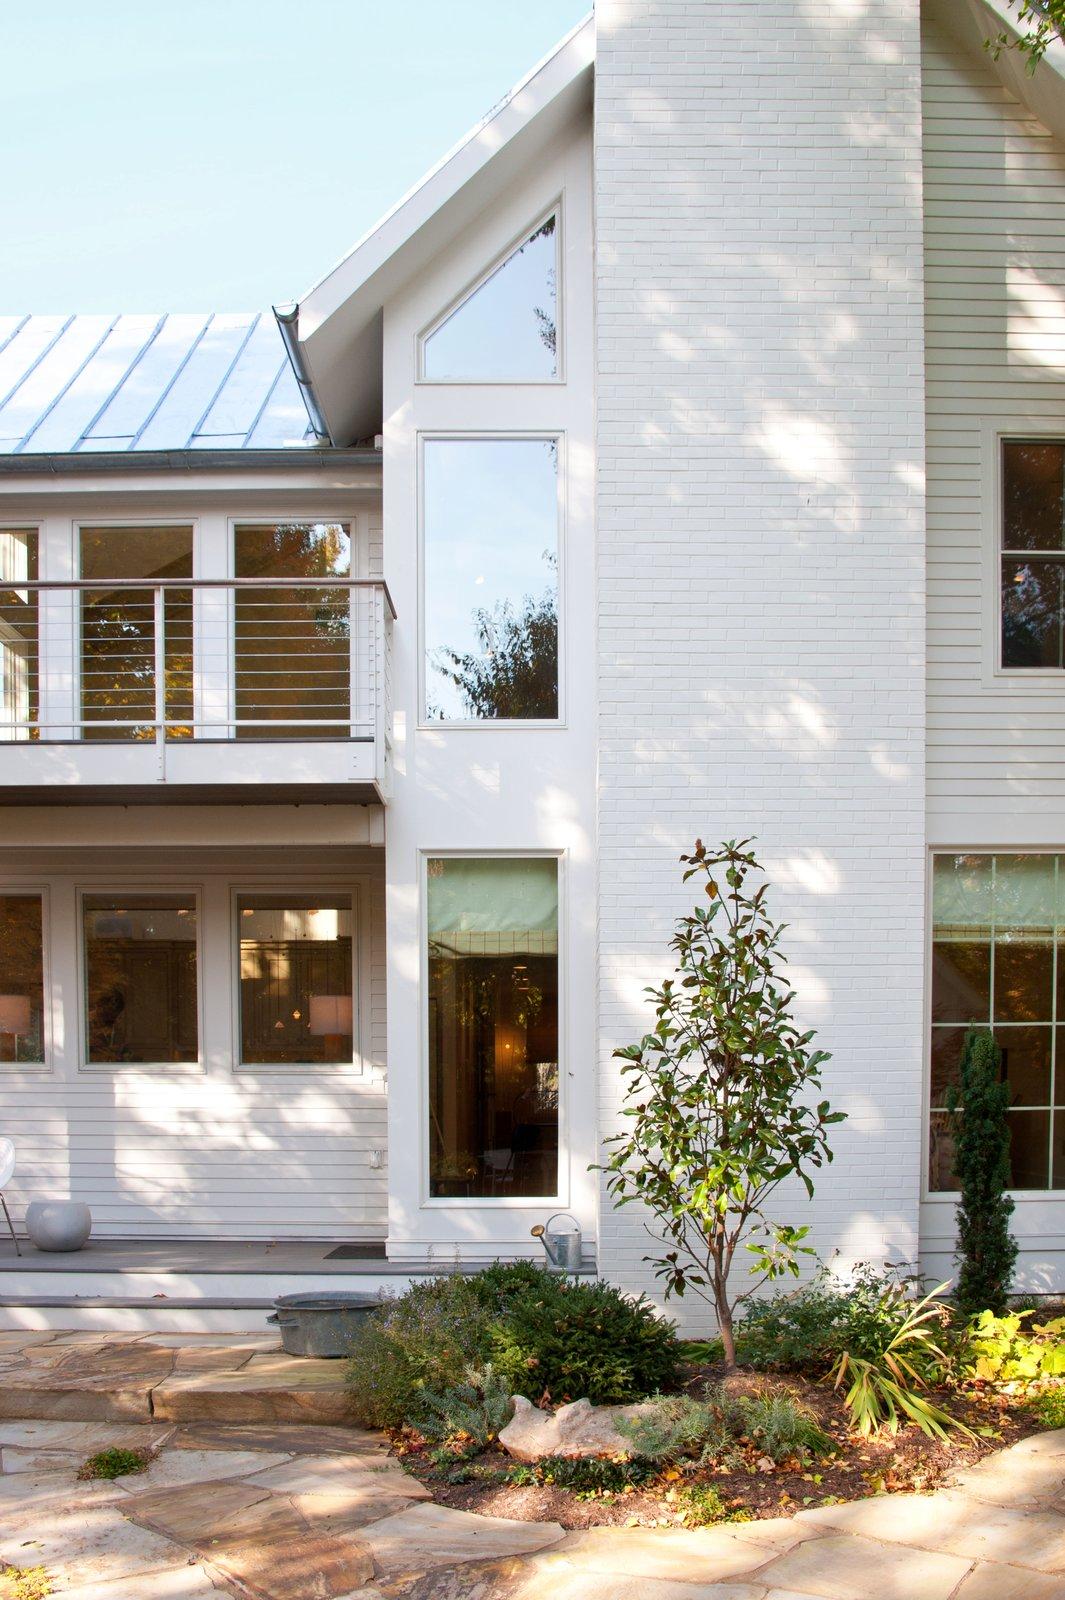 Outdoor, Back Yard, Shrubs, and Stone Patio, Porch, Deck  Urban Farmhouse